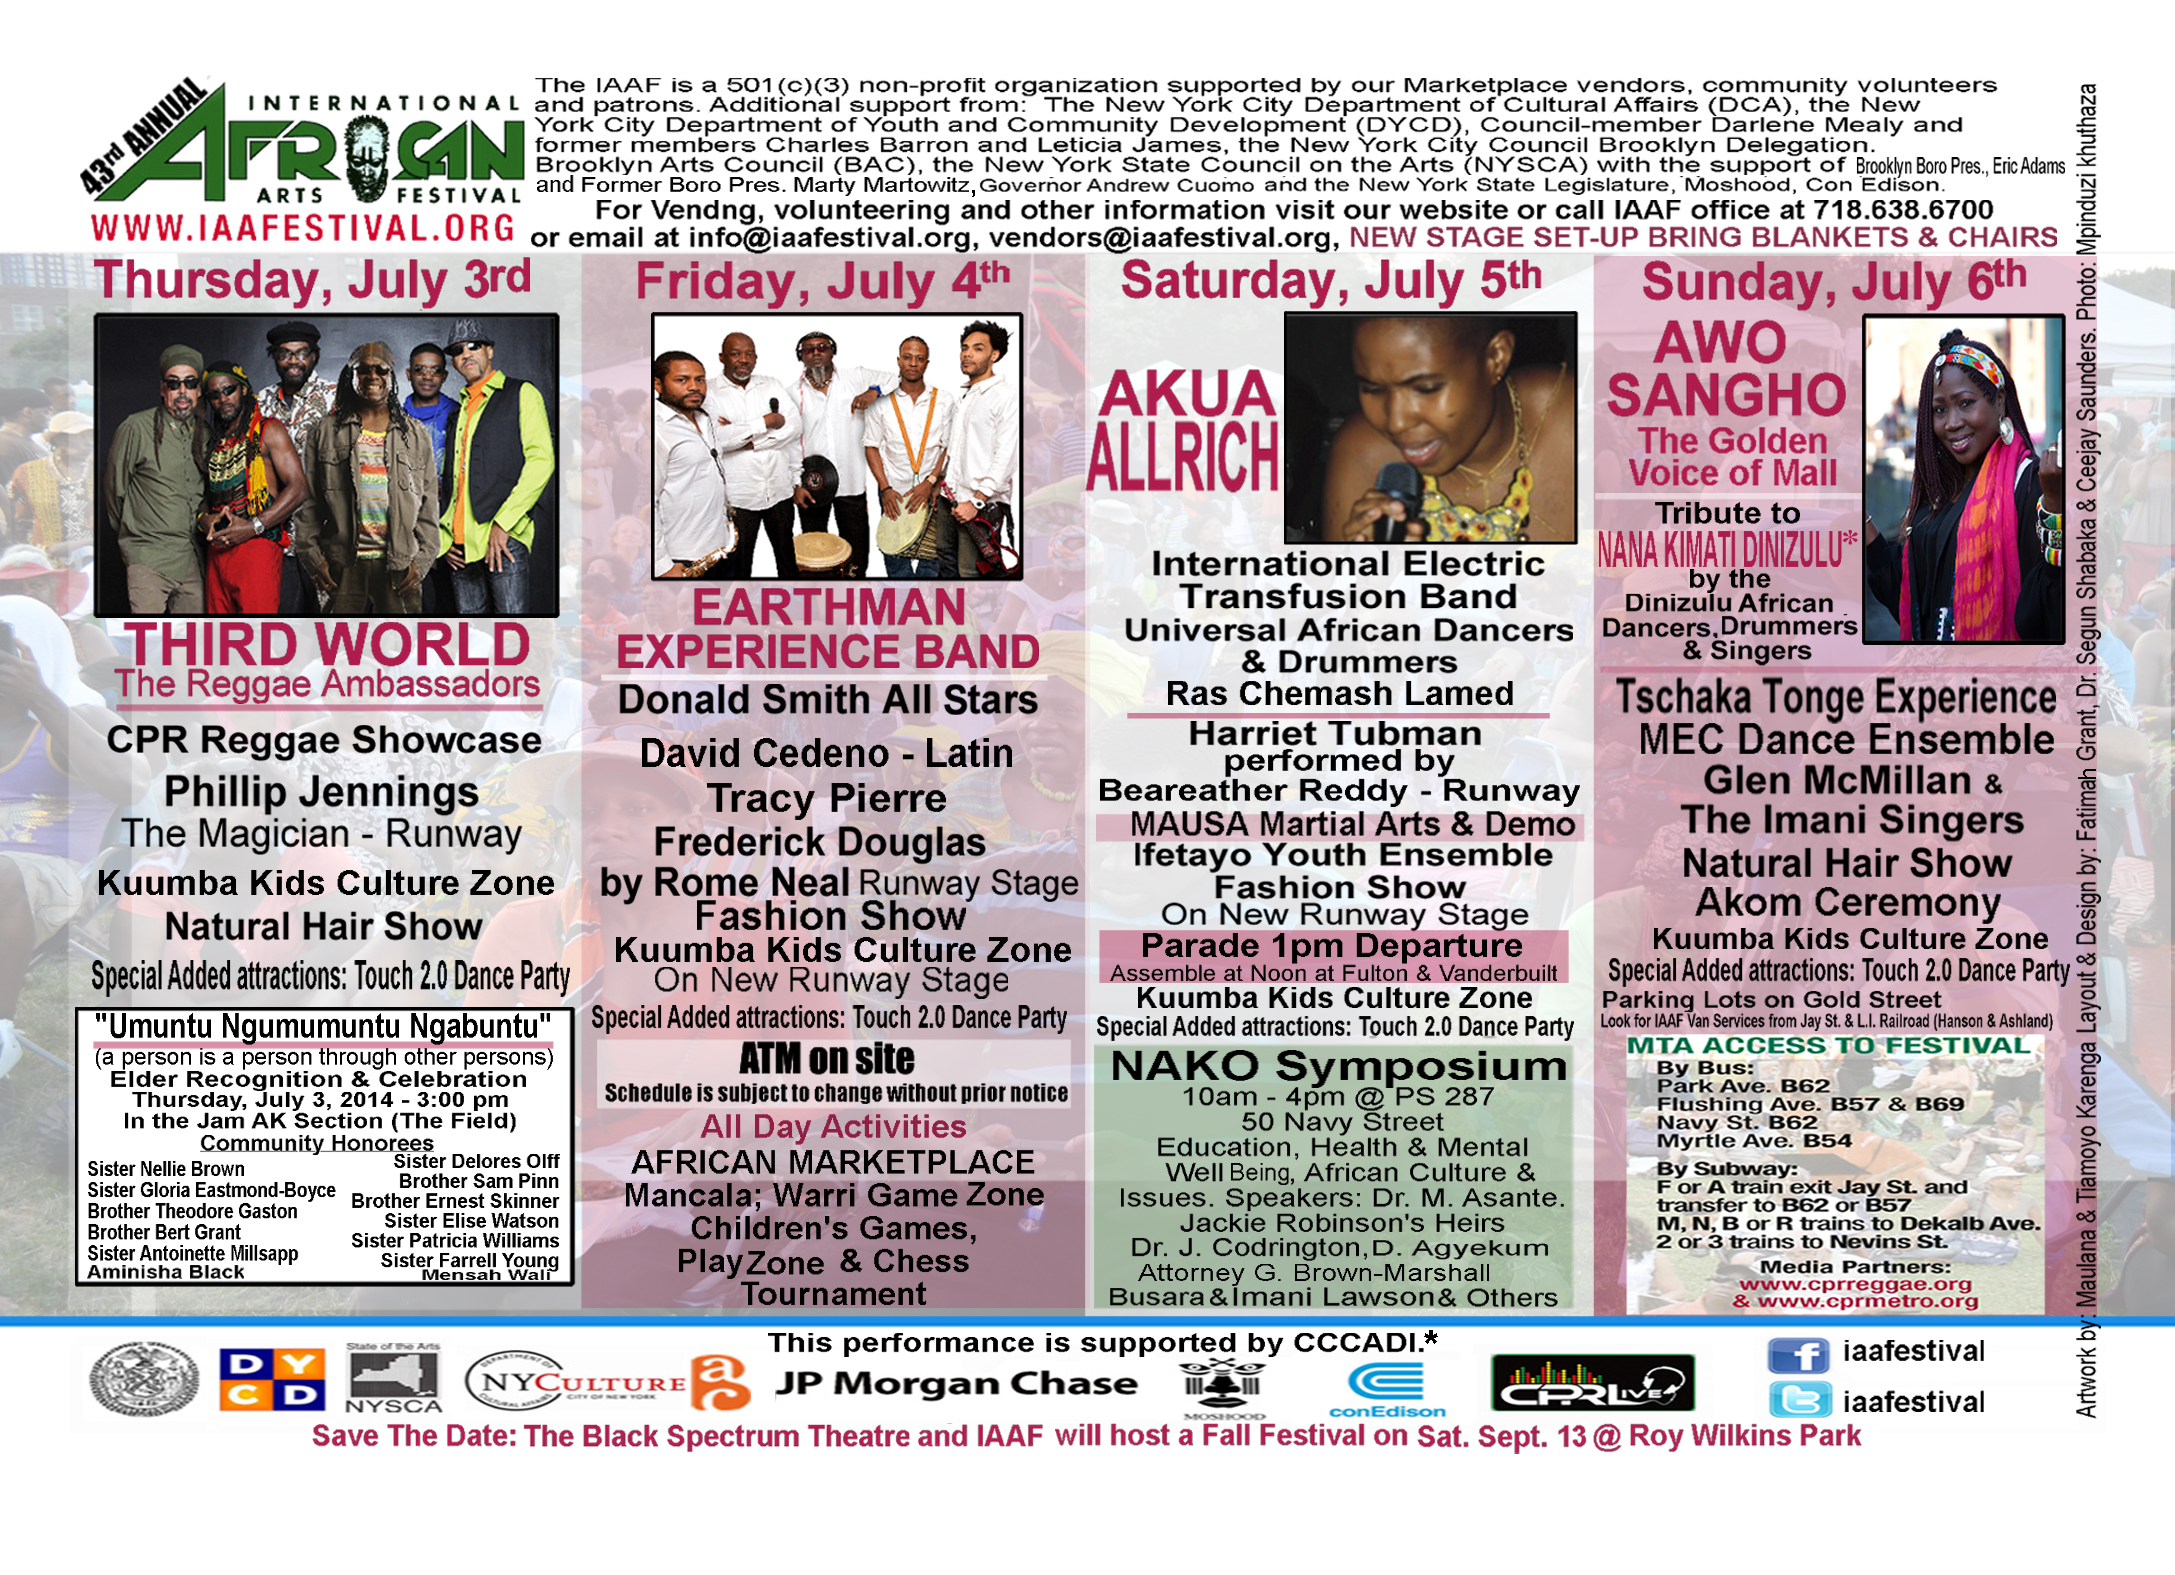 african arts festival-7x5-6_24